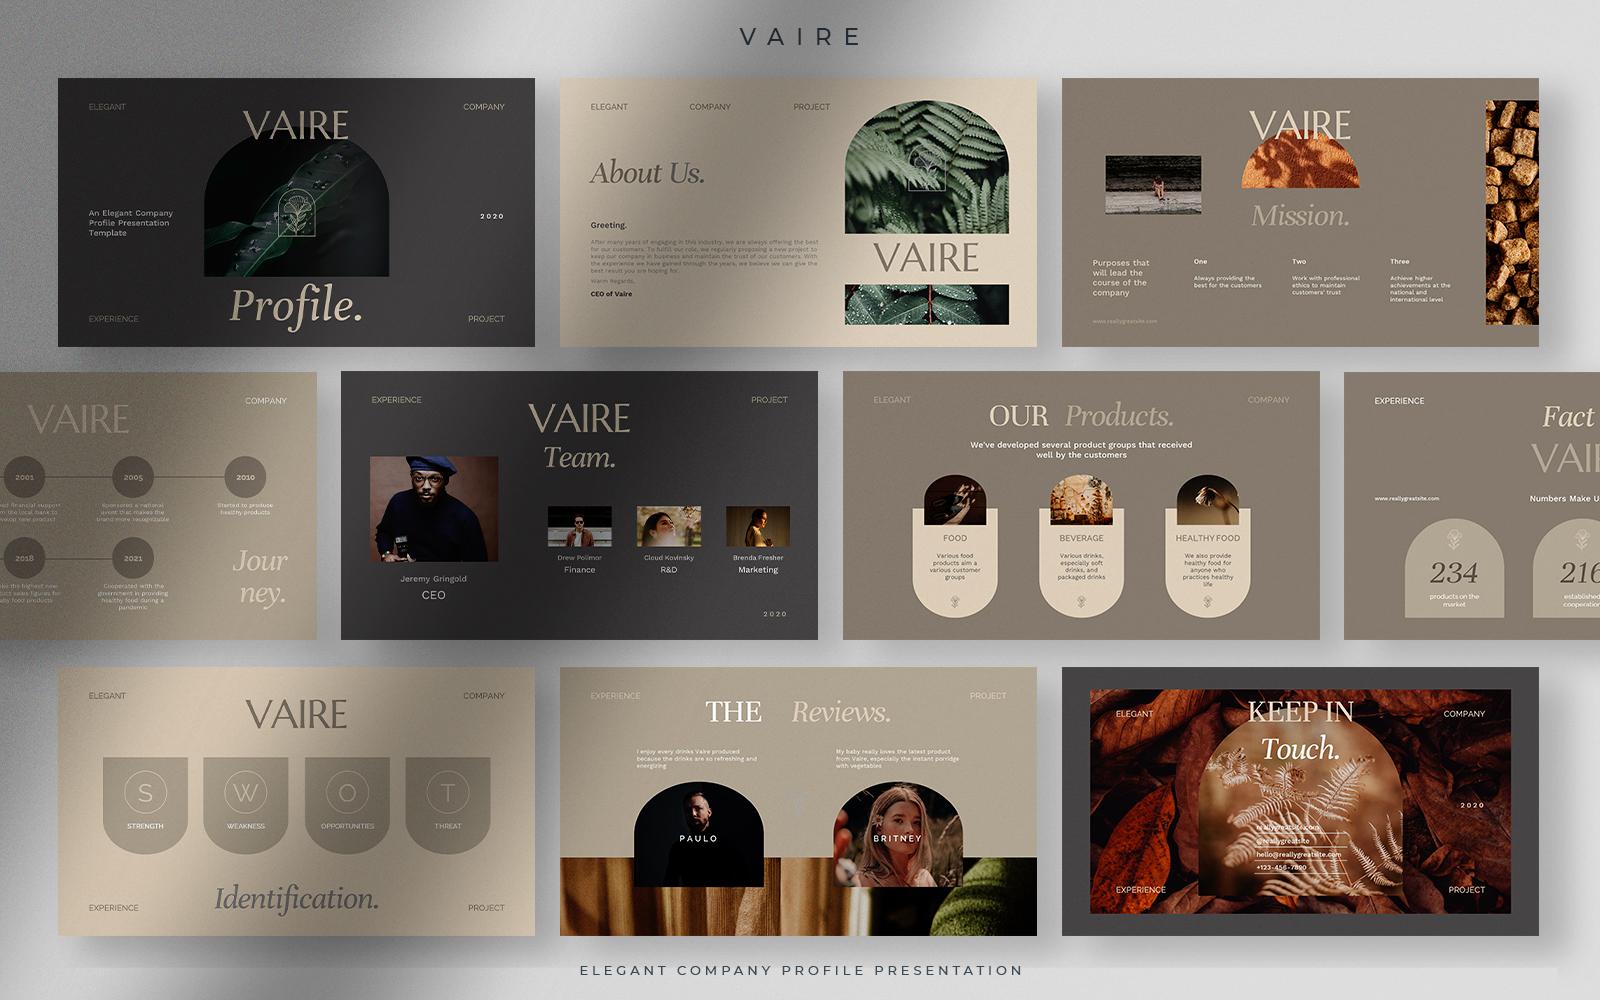 Vaire - Elegant Company Profile Presentation